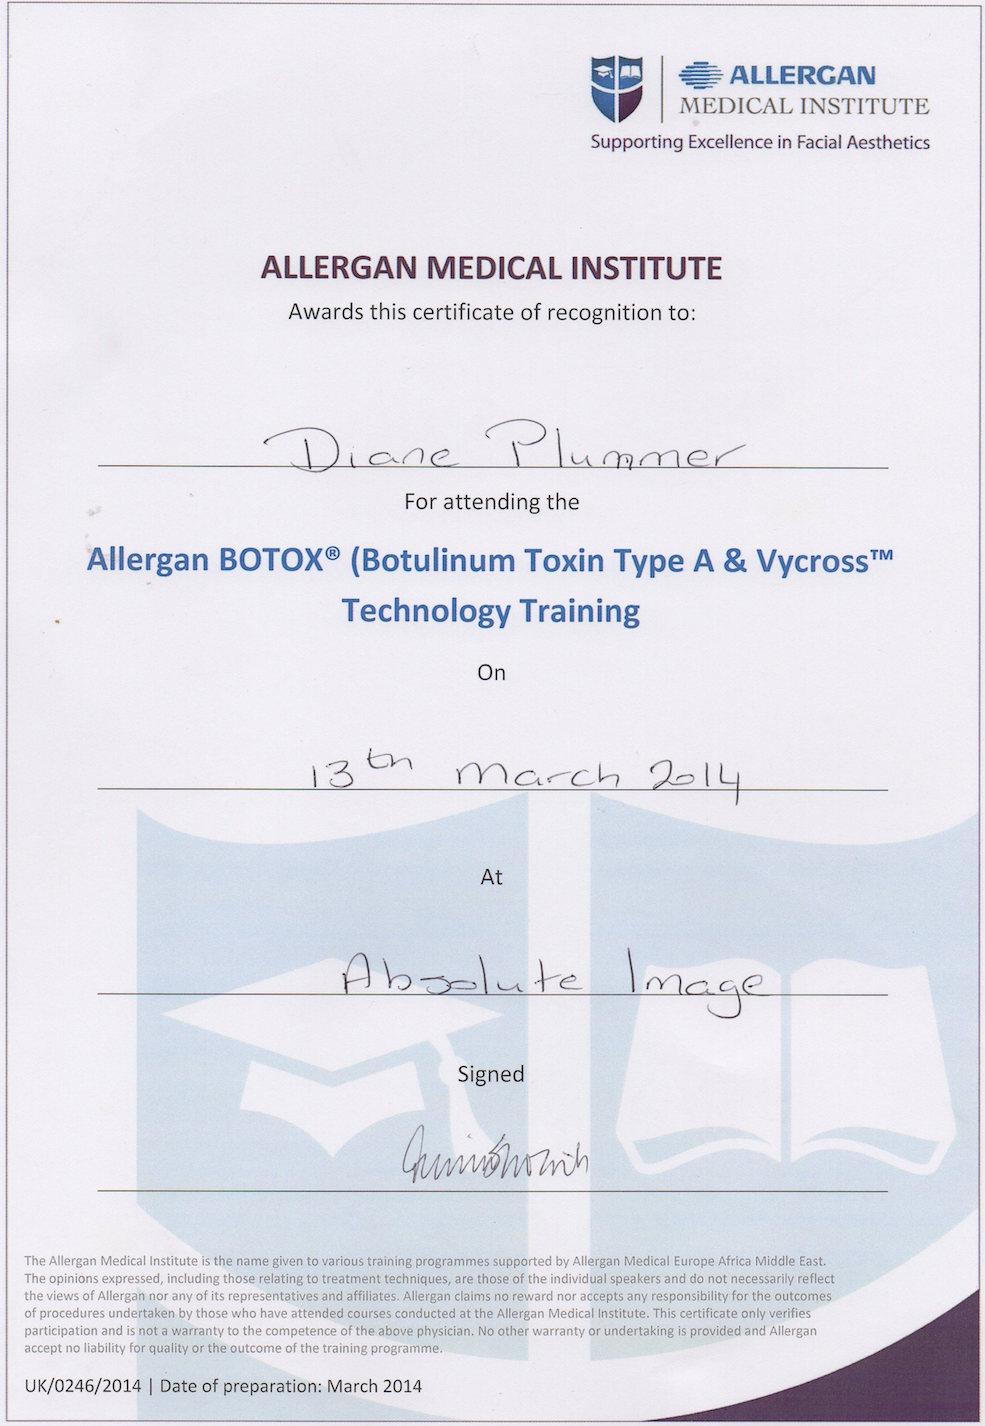 Allergan Medical Institute - Botox & Vycross technology training